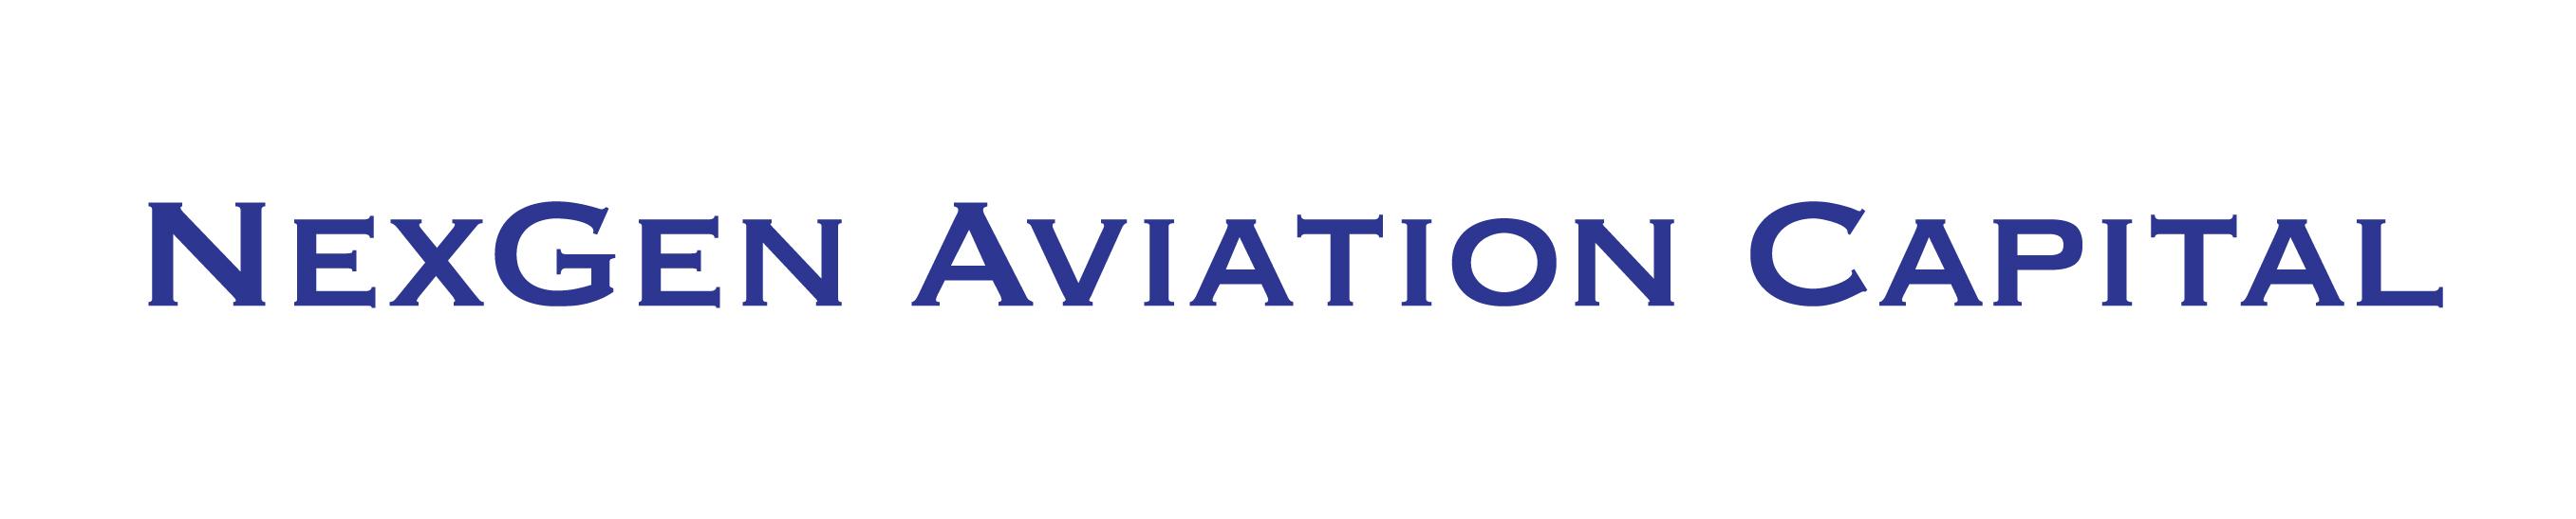 NexGen Aviation Capital